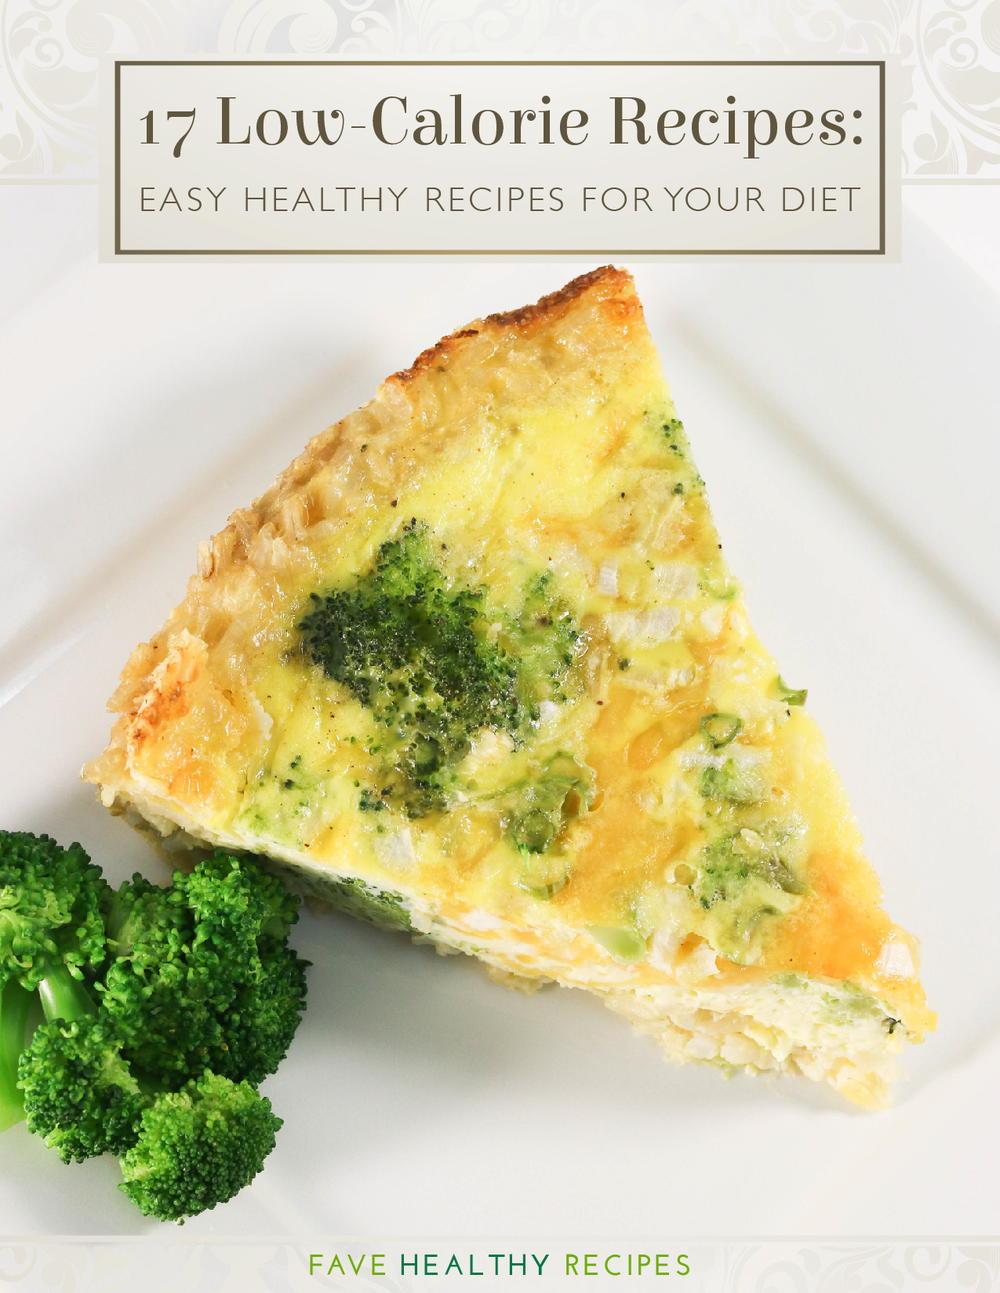 17 Low Calorie Recipes Easy Healthy Recipes For Your Diet Favehealthyrecipes Com